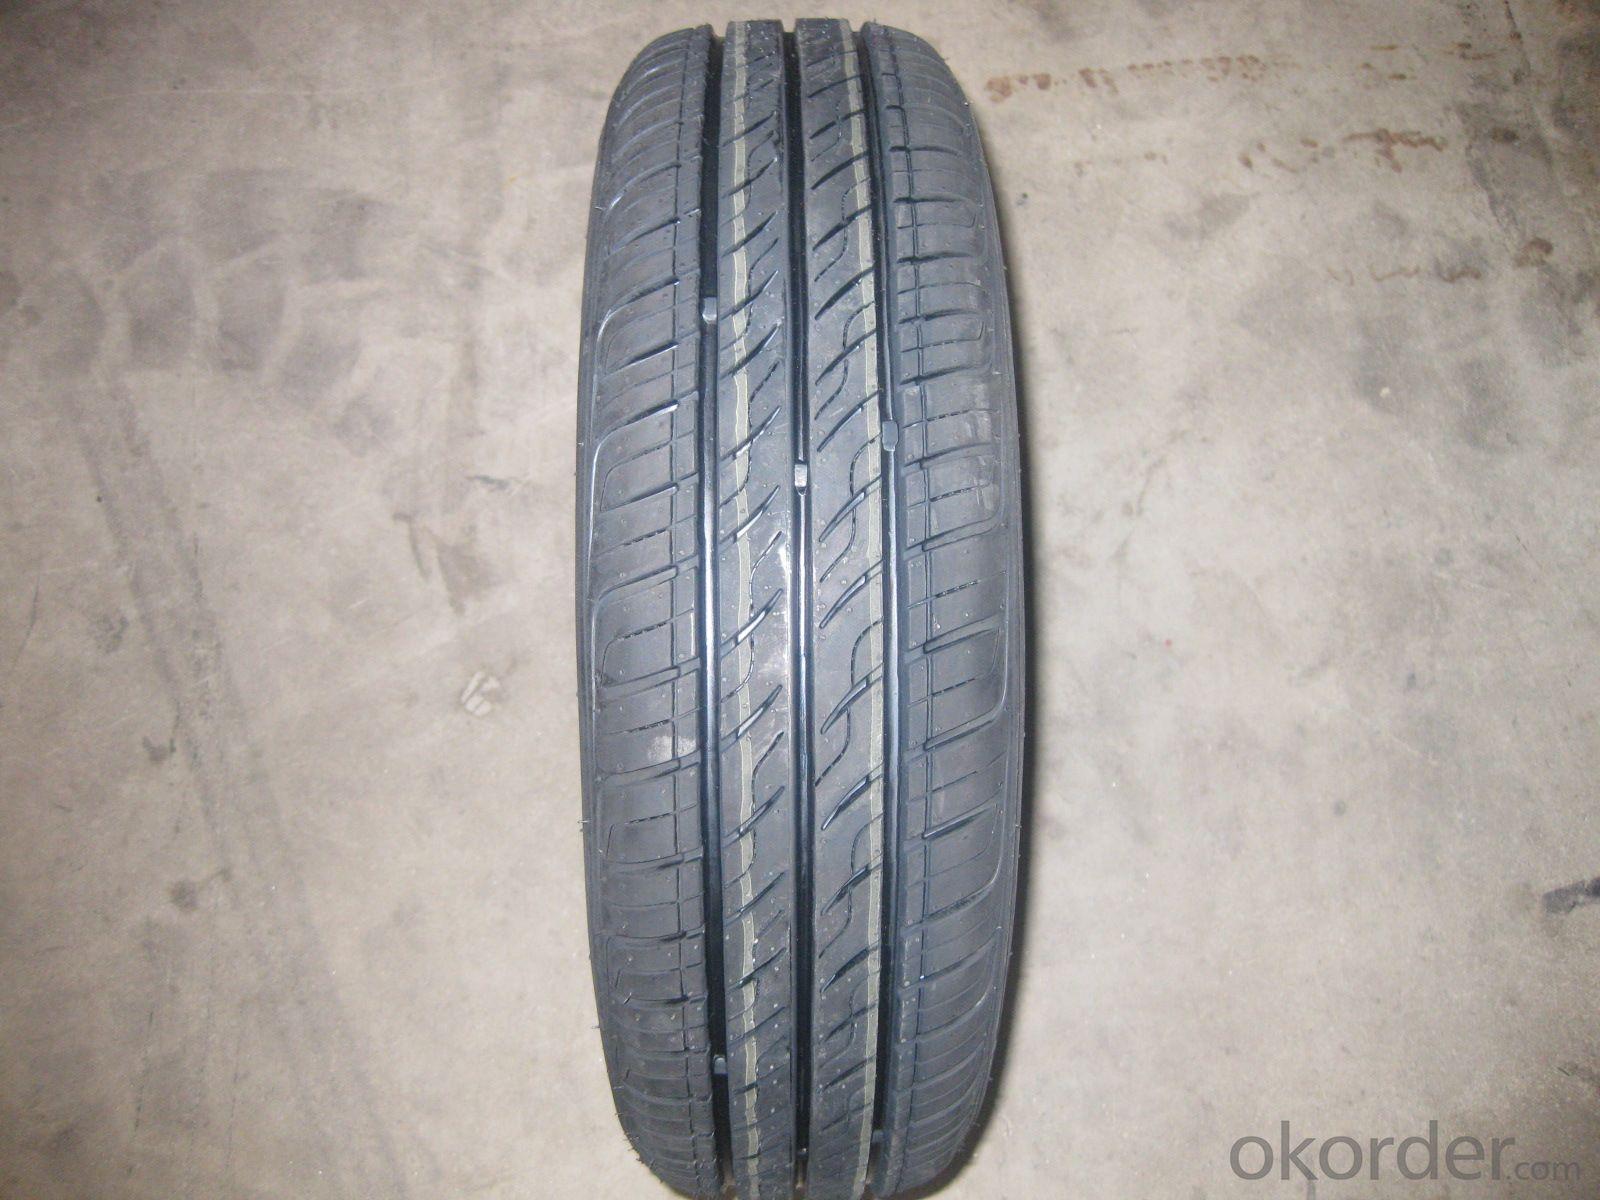 Passage Car Radial Tyre 145/70R12 LT X1